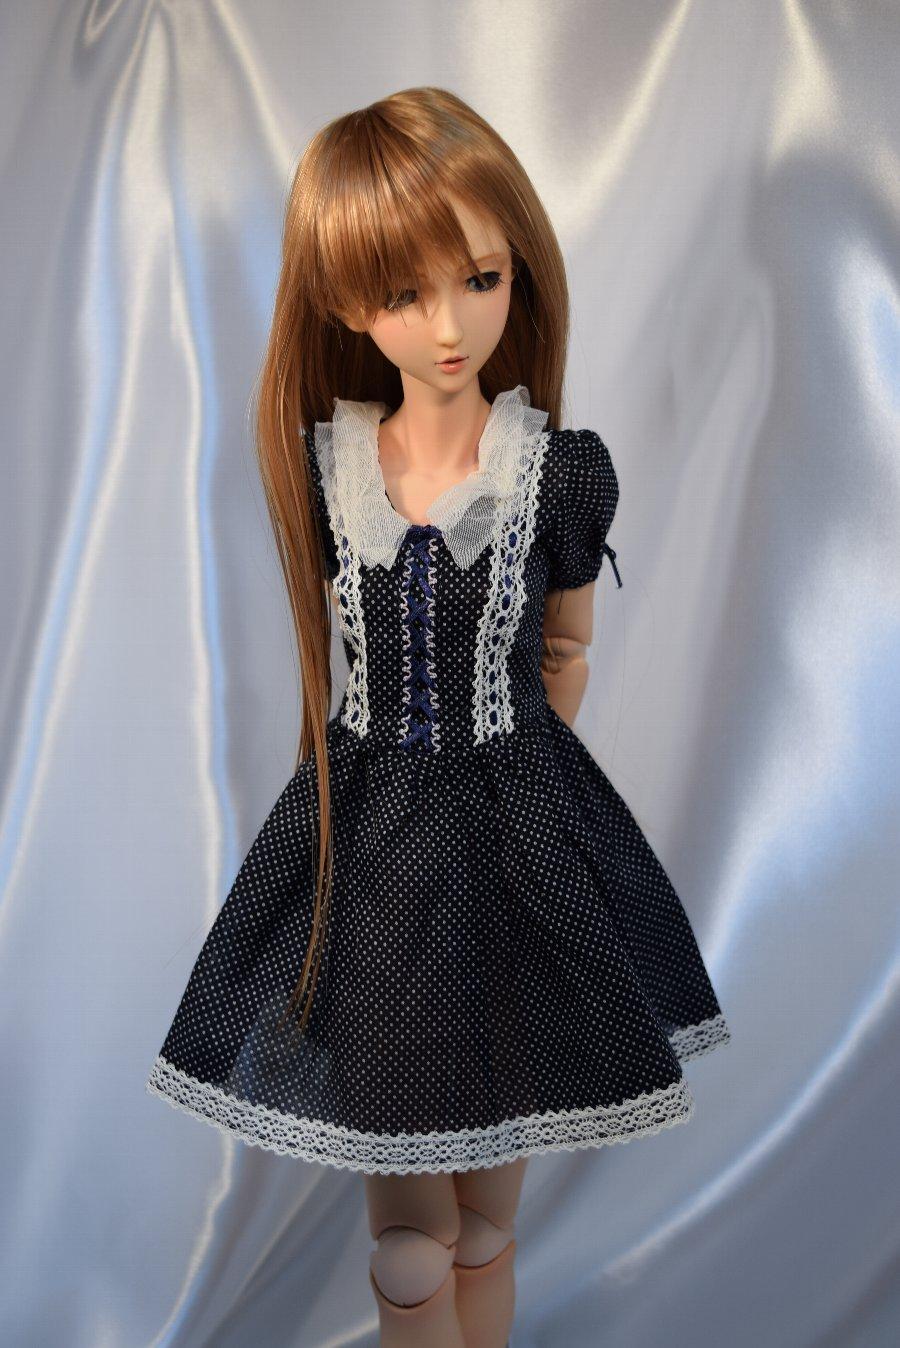 doll_043.jpg